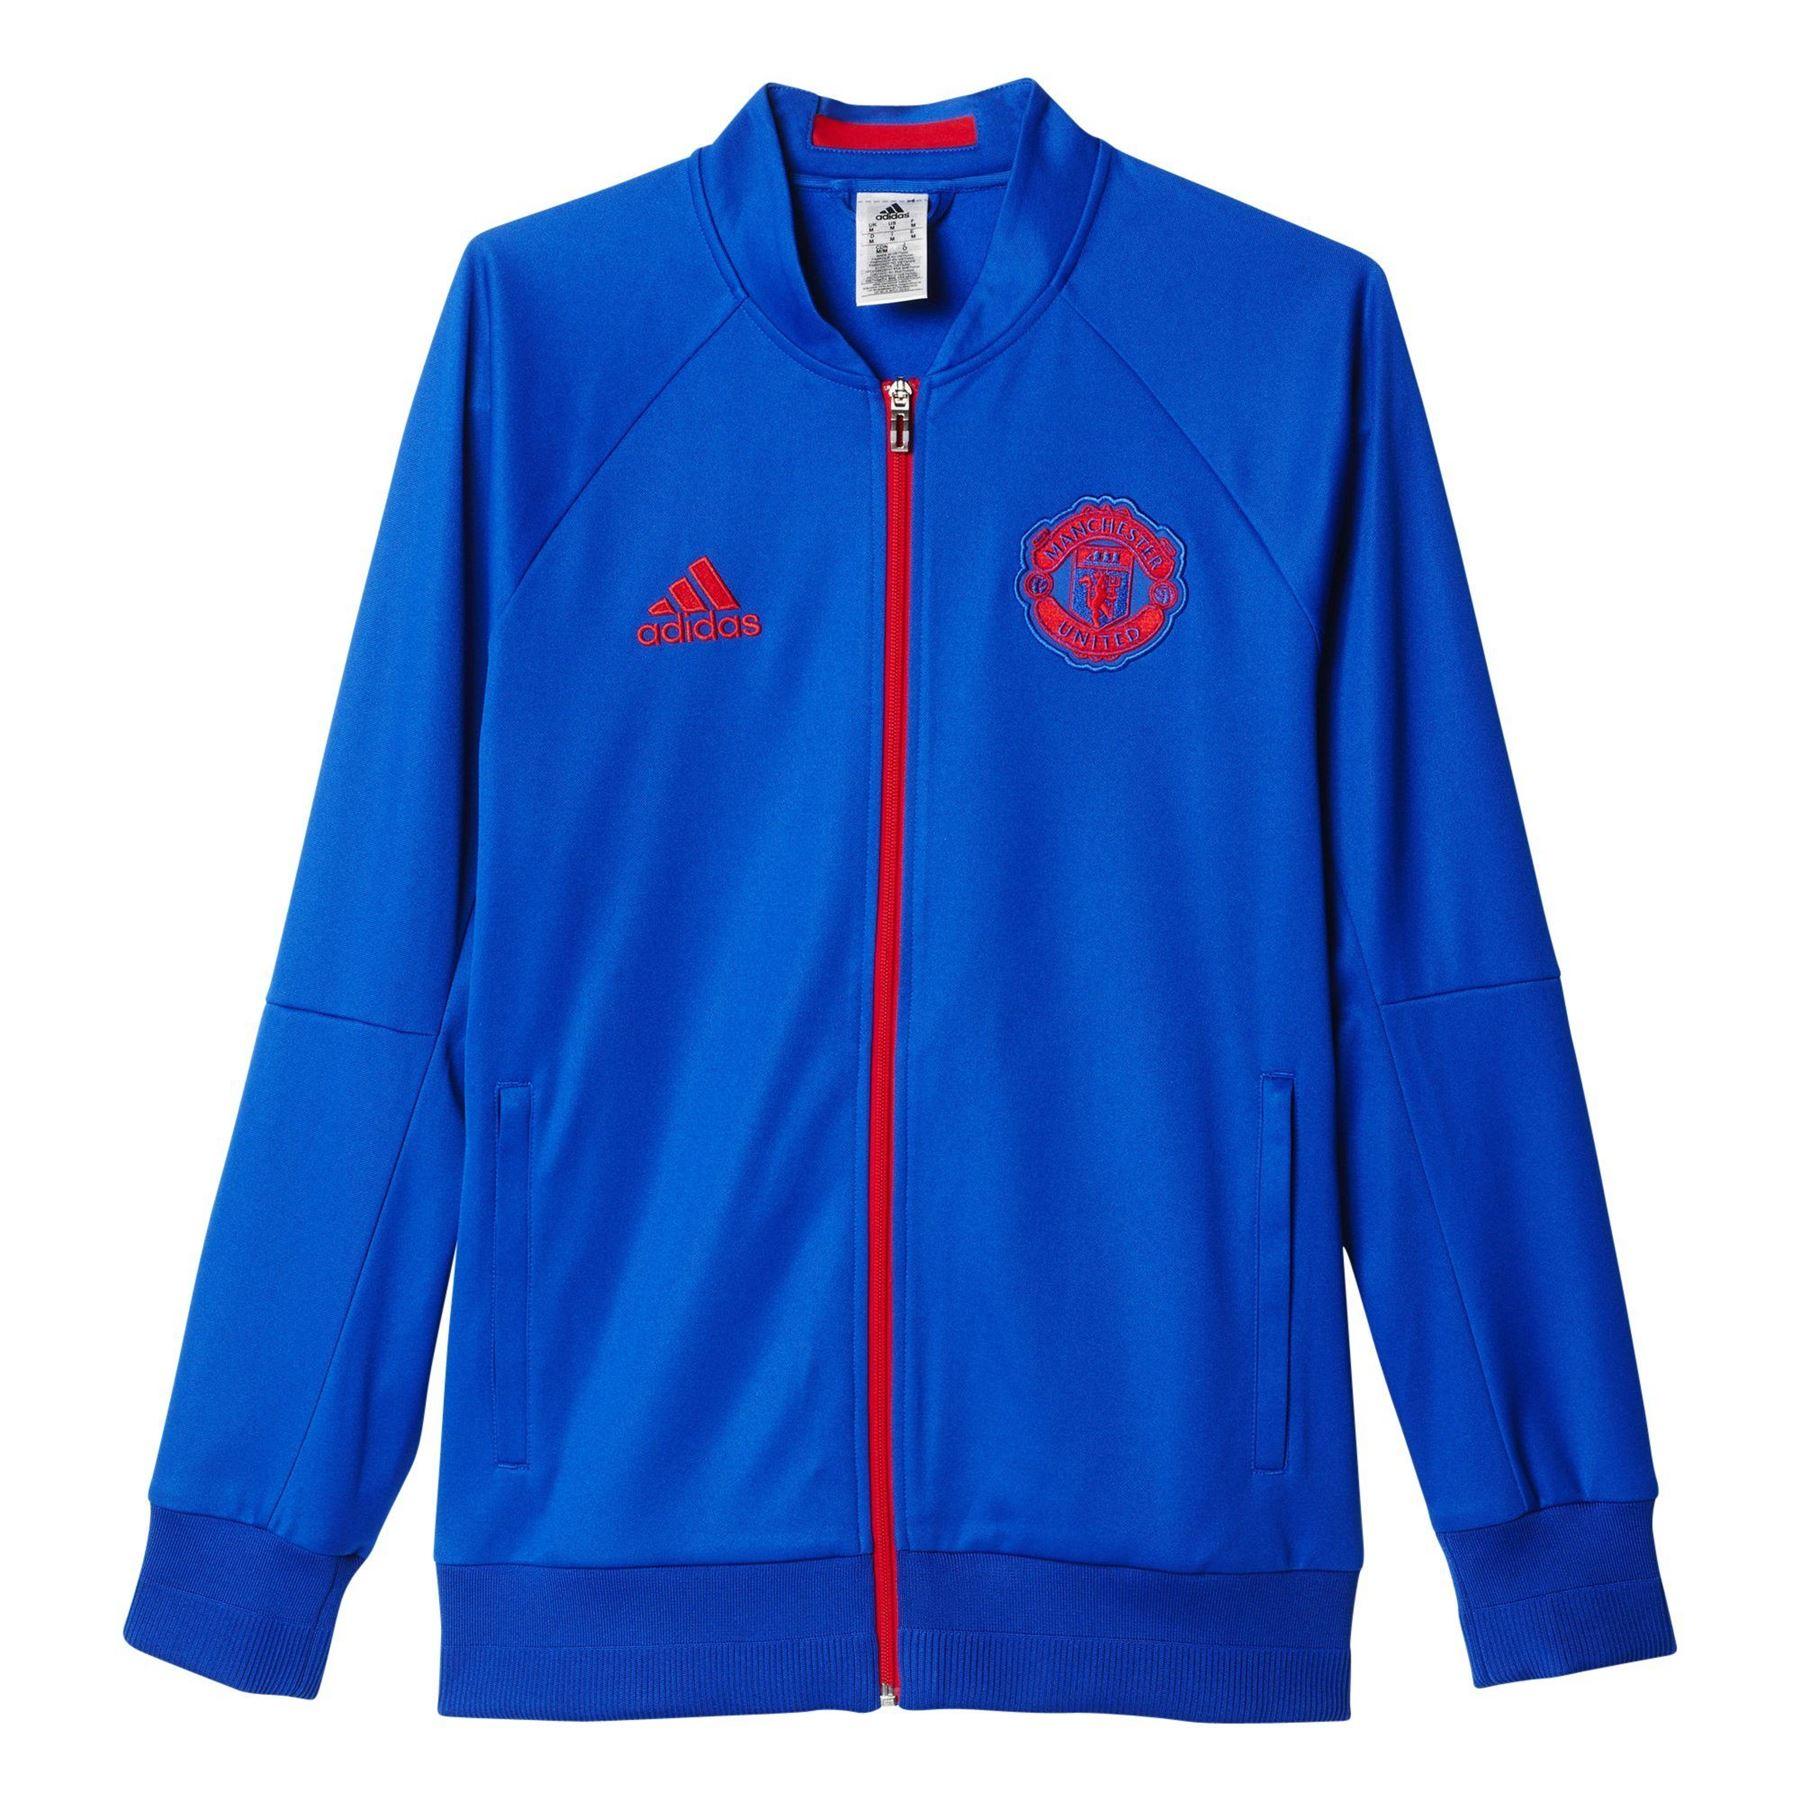 Adidas MANCHESTER UNITED lejos himno chaqueta azul pista superior fútbol  nuevo rojo bc5b4fe90575b